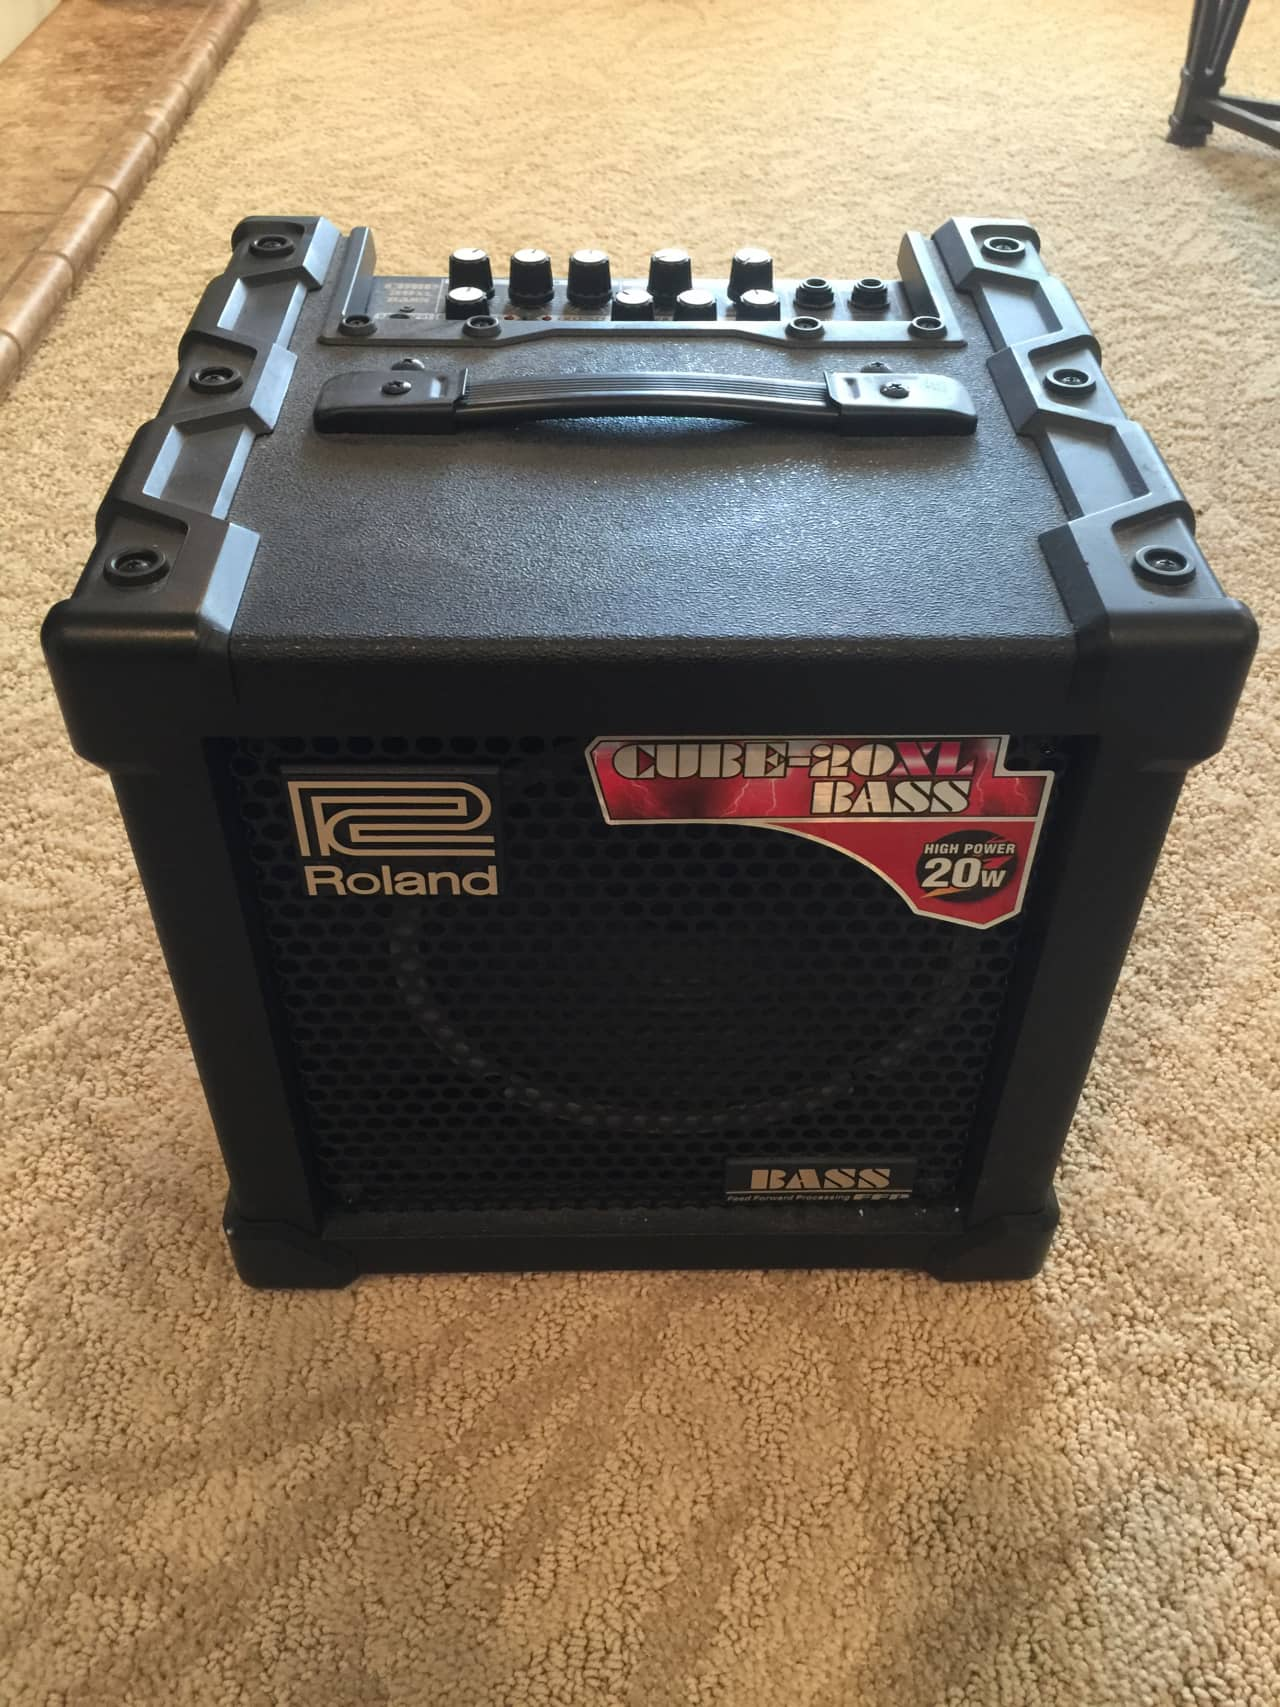 roland cube 20xl bass manual